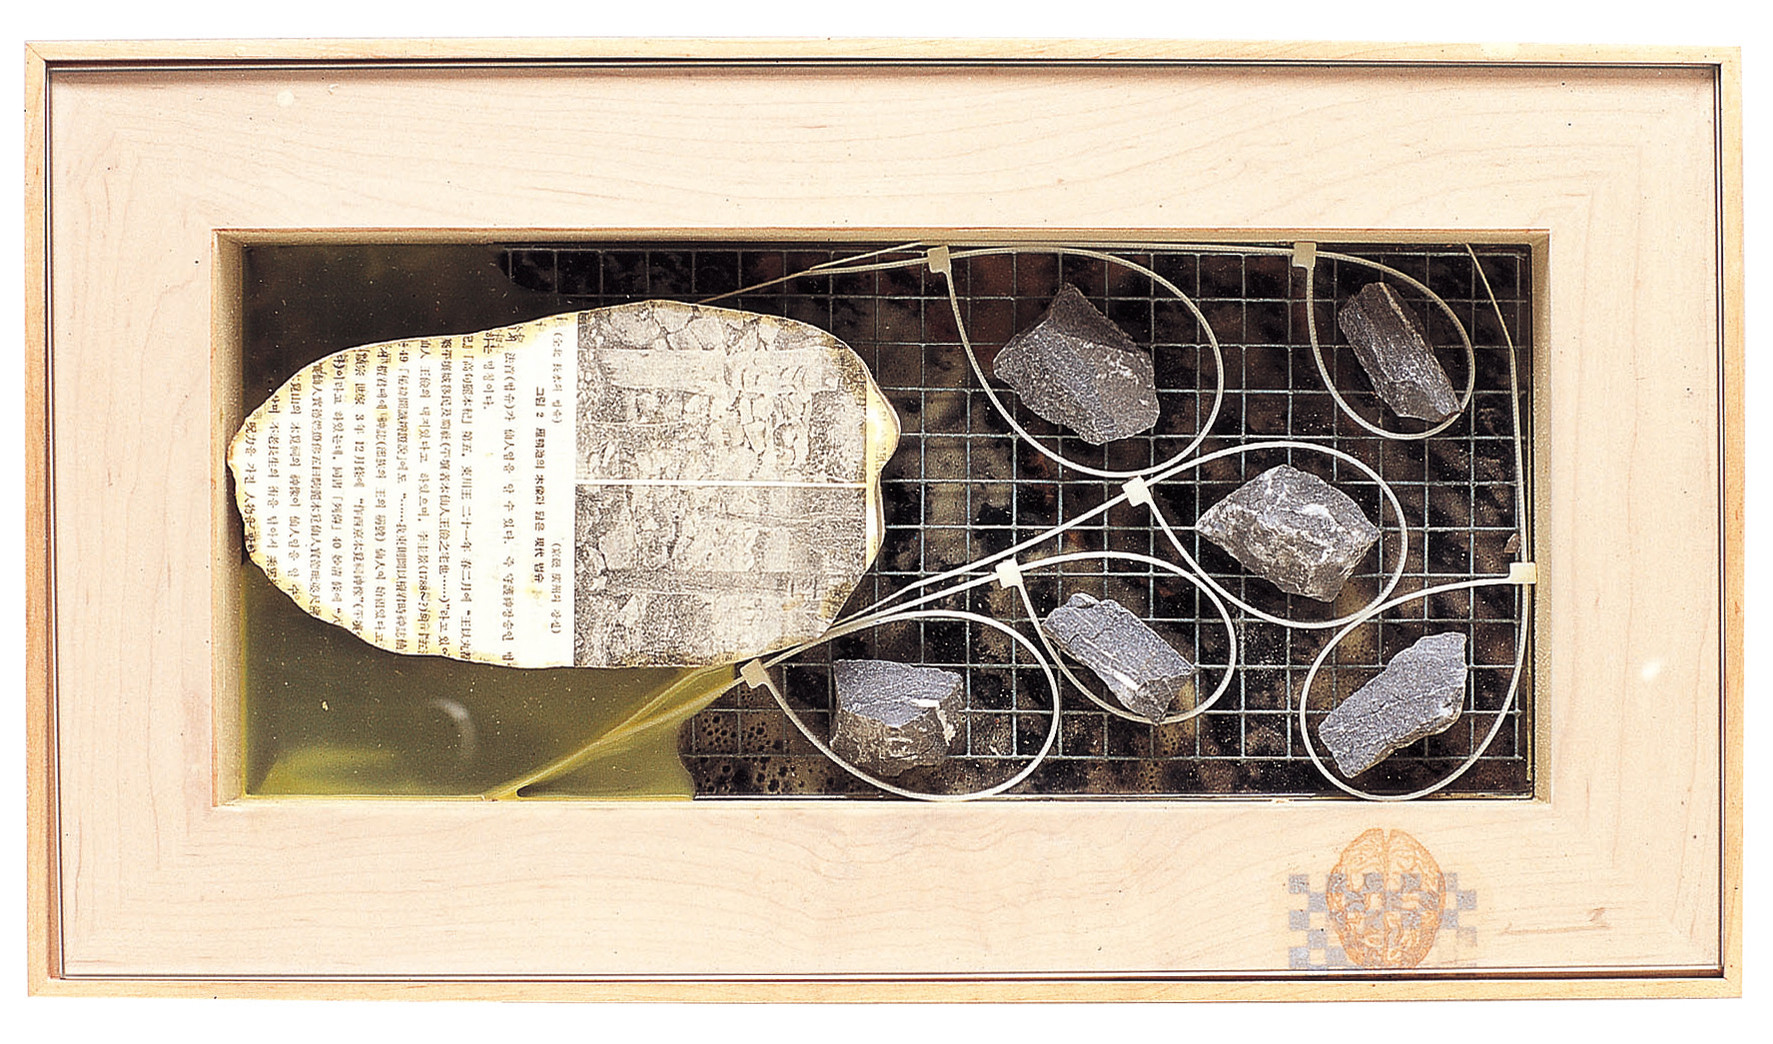 Fossilscape 1